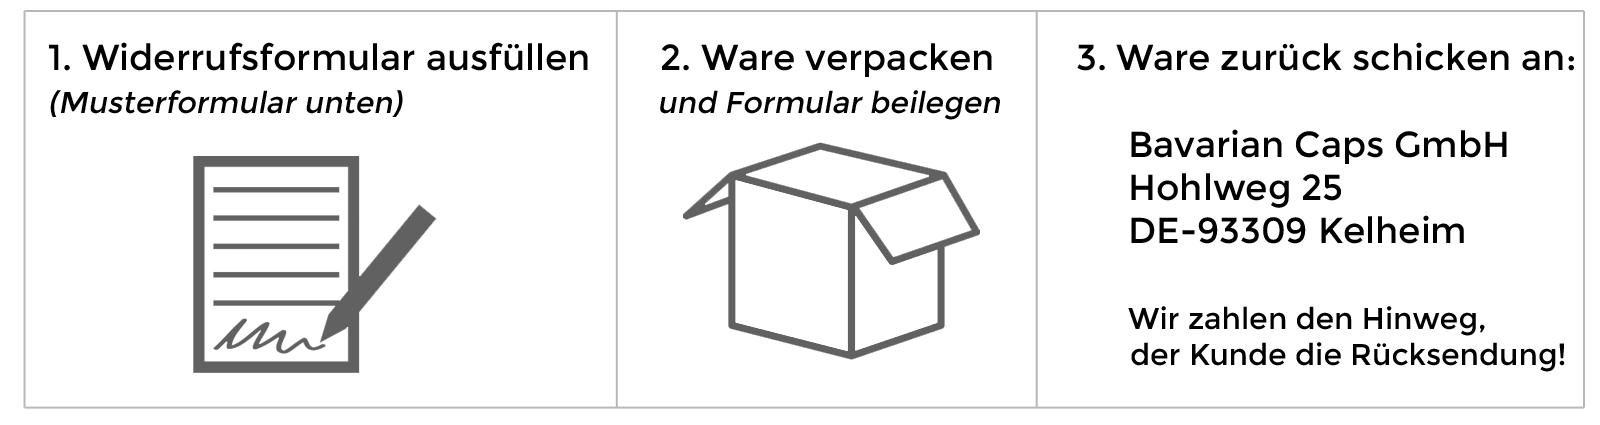 Bavarian Caps Tradition Neu Definiert